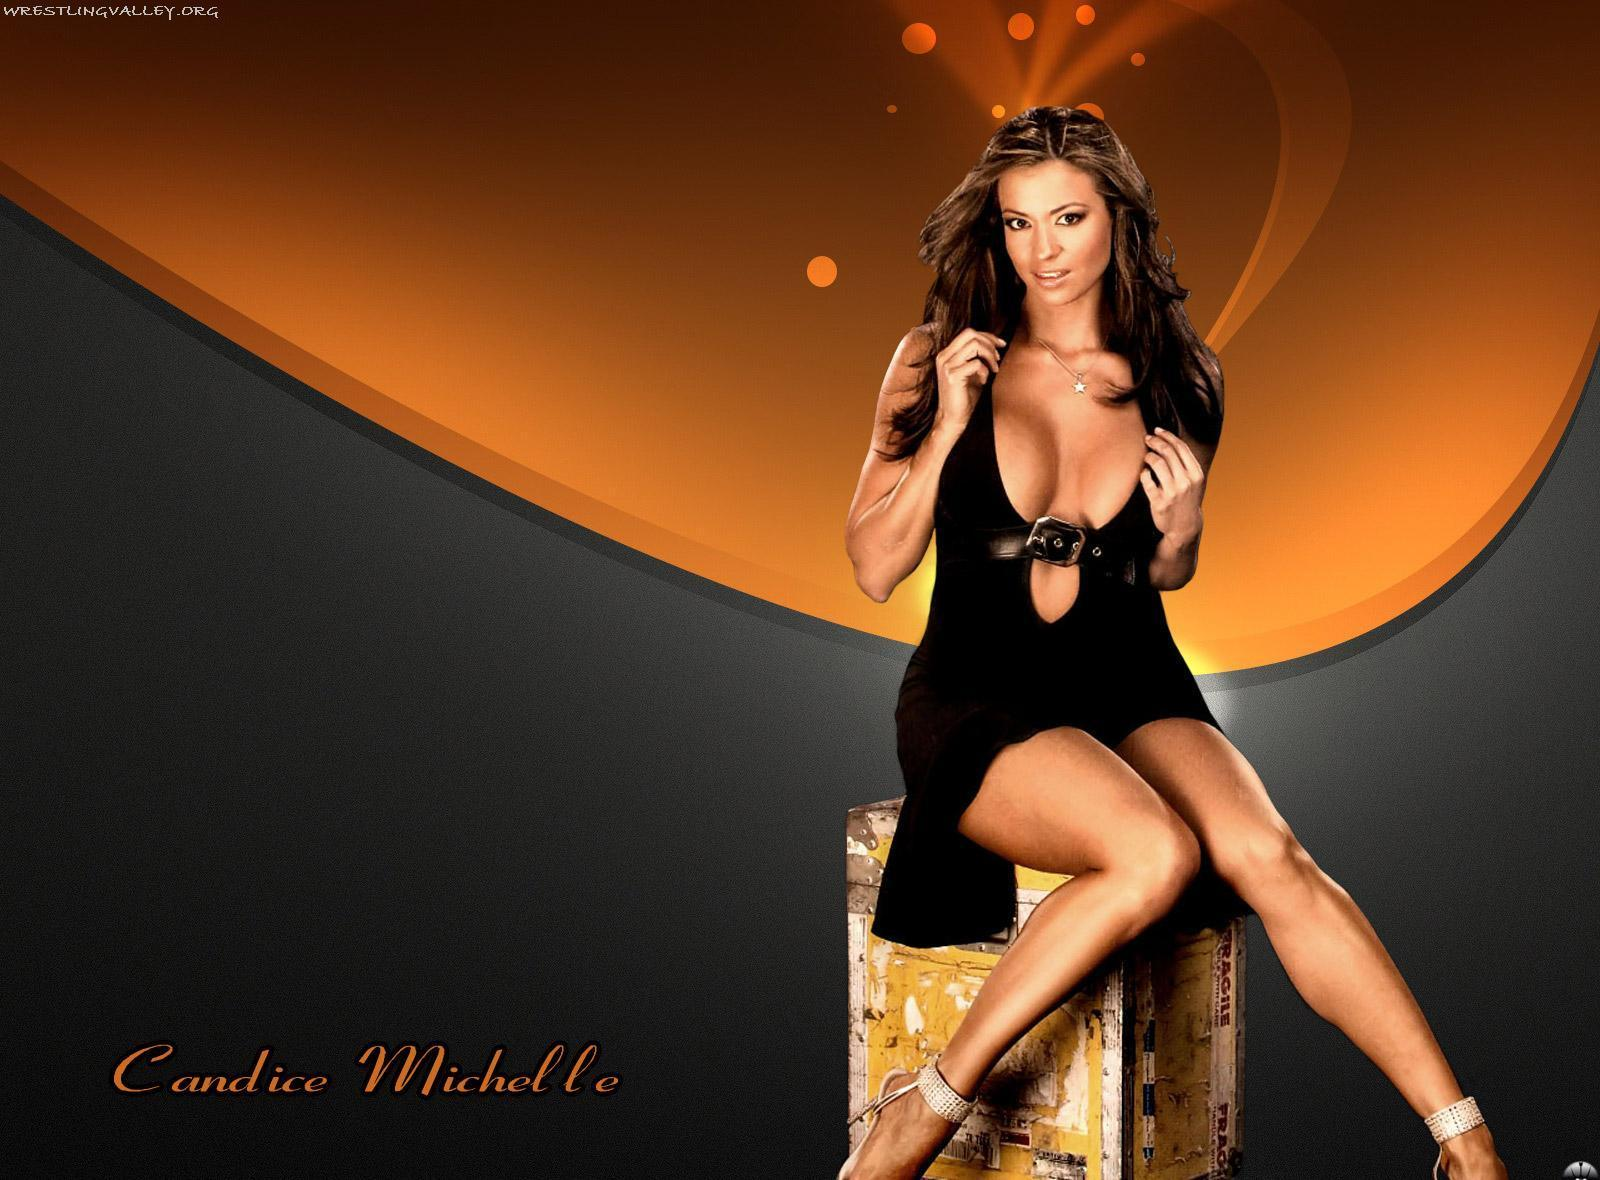 Candice Michelle - WWE Divas